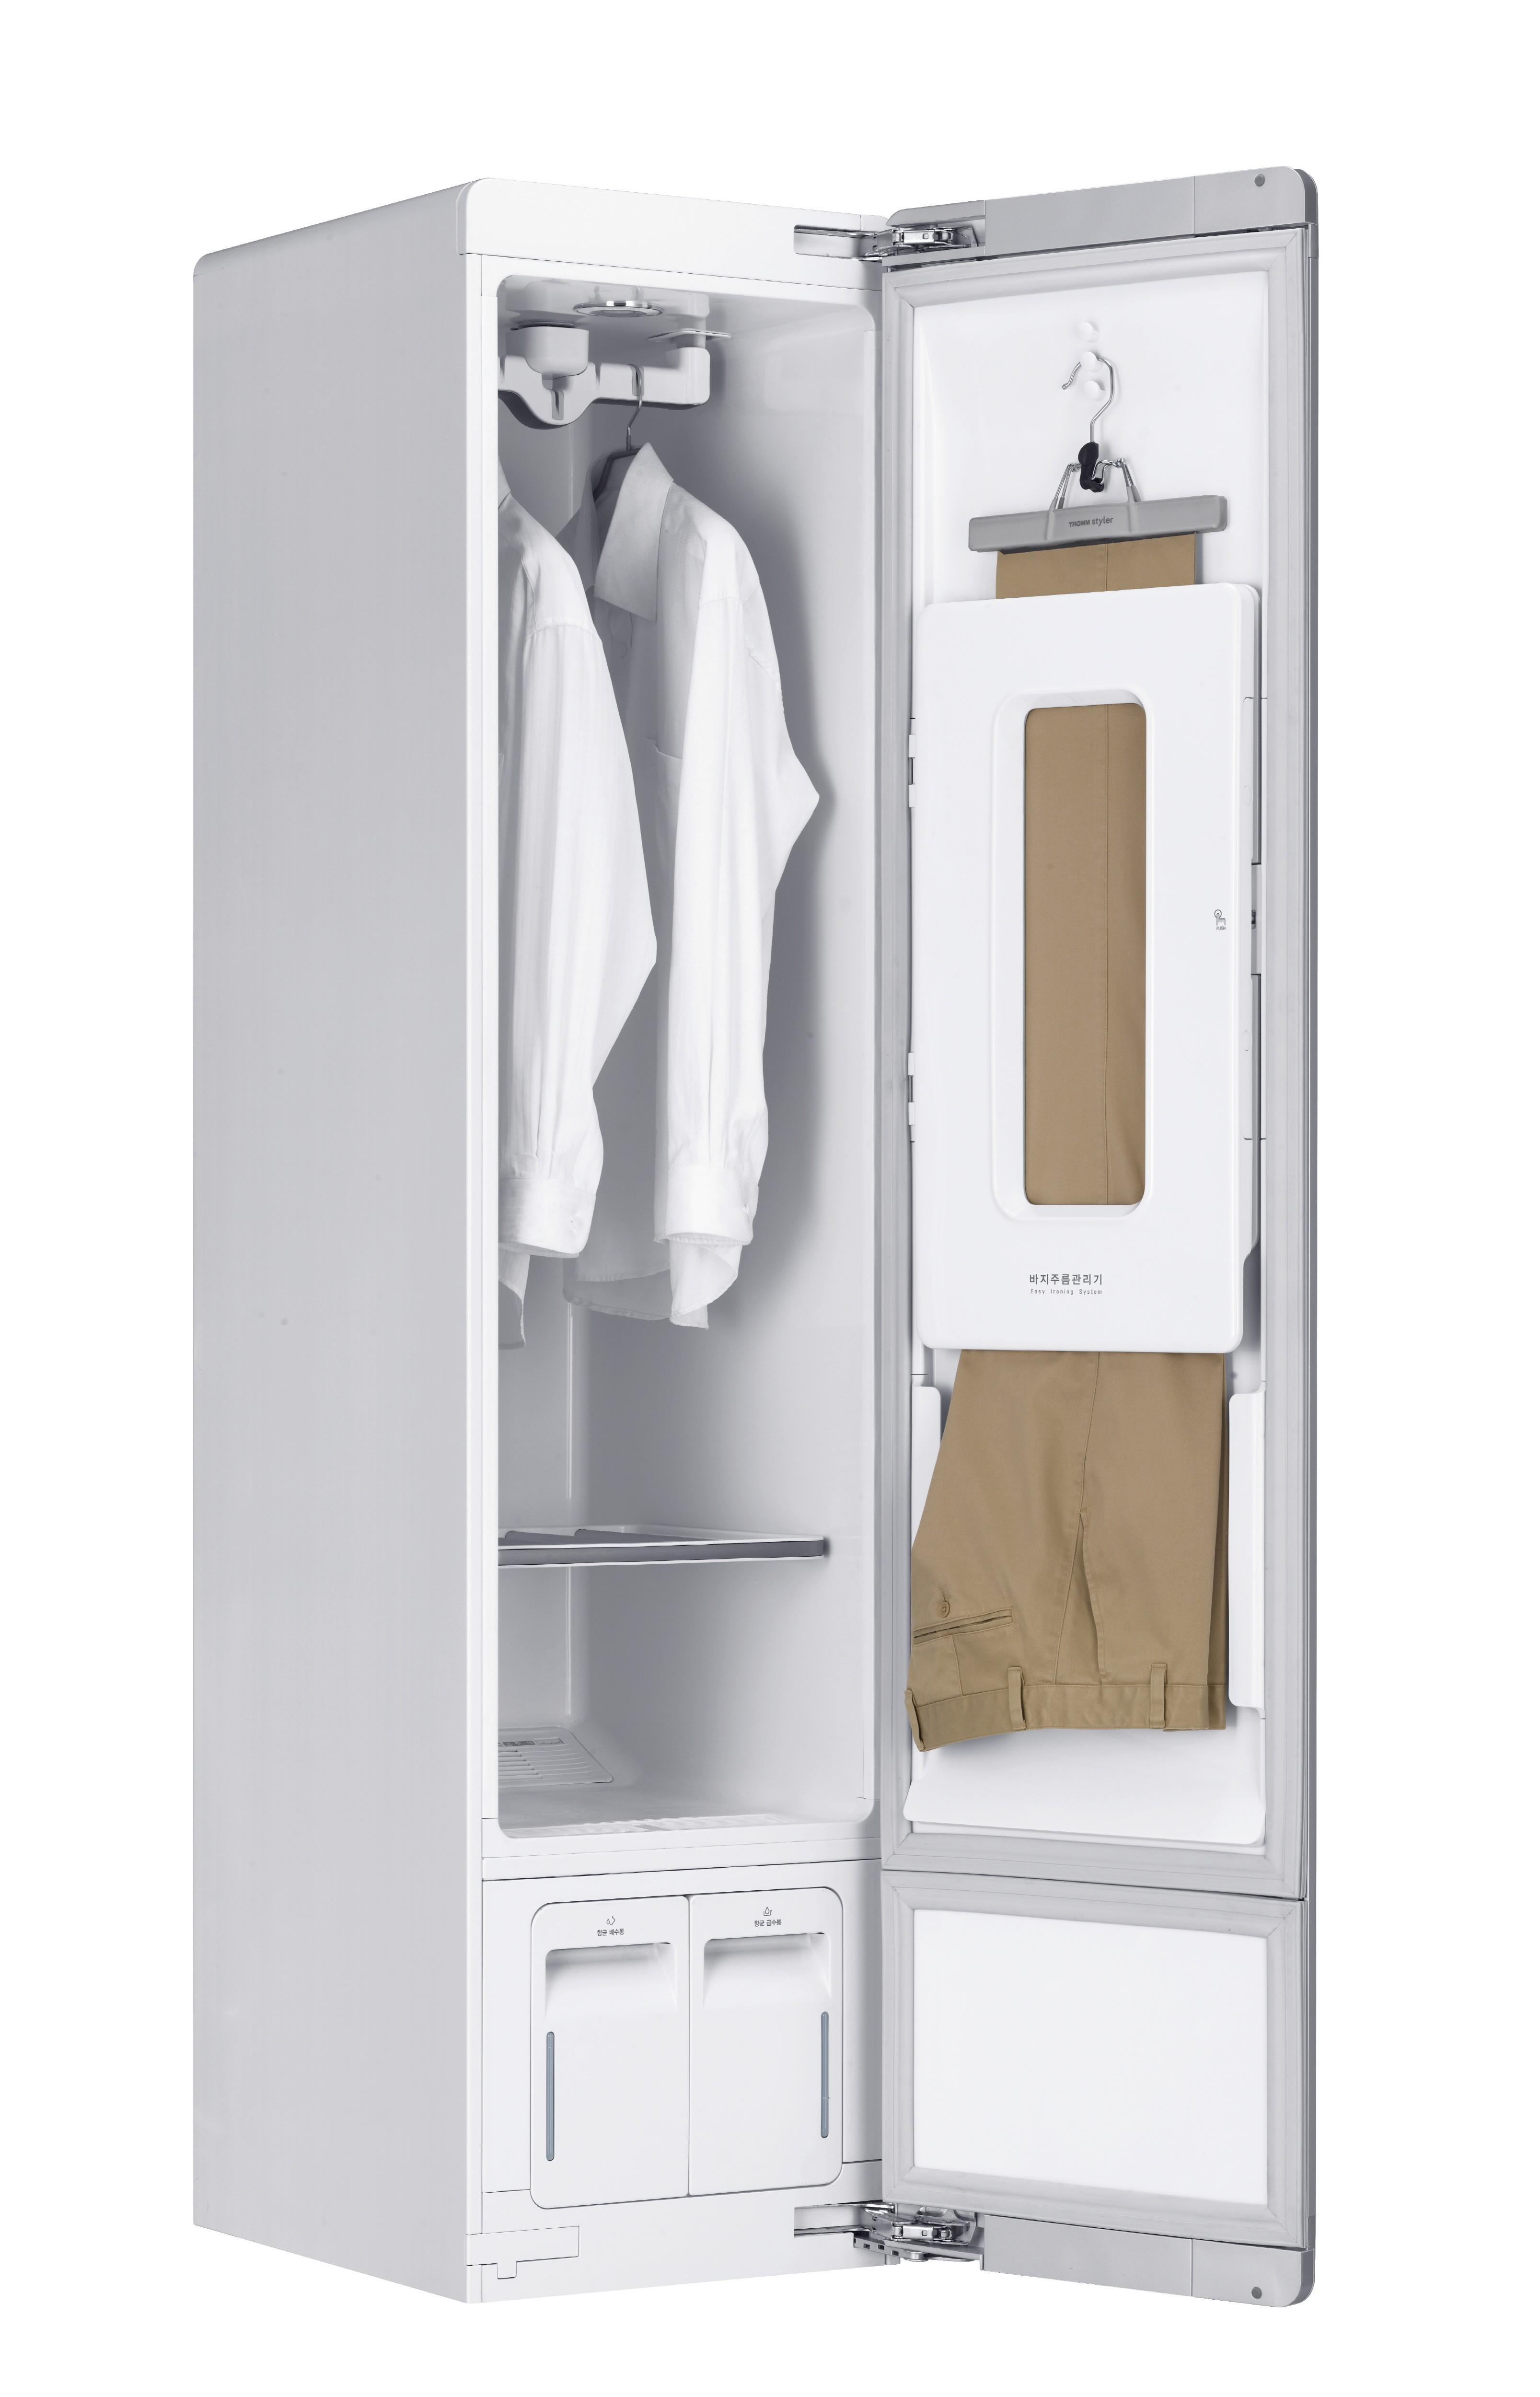 usa plus wh white bathtubs closet virtu bathroom es in vanity steam cabinet cab khaleesi